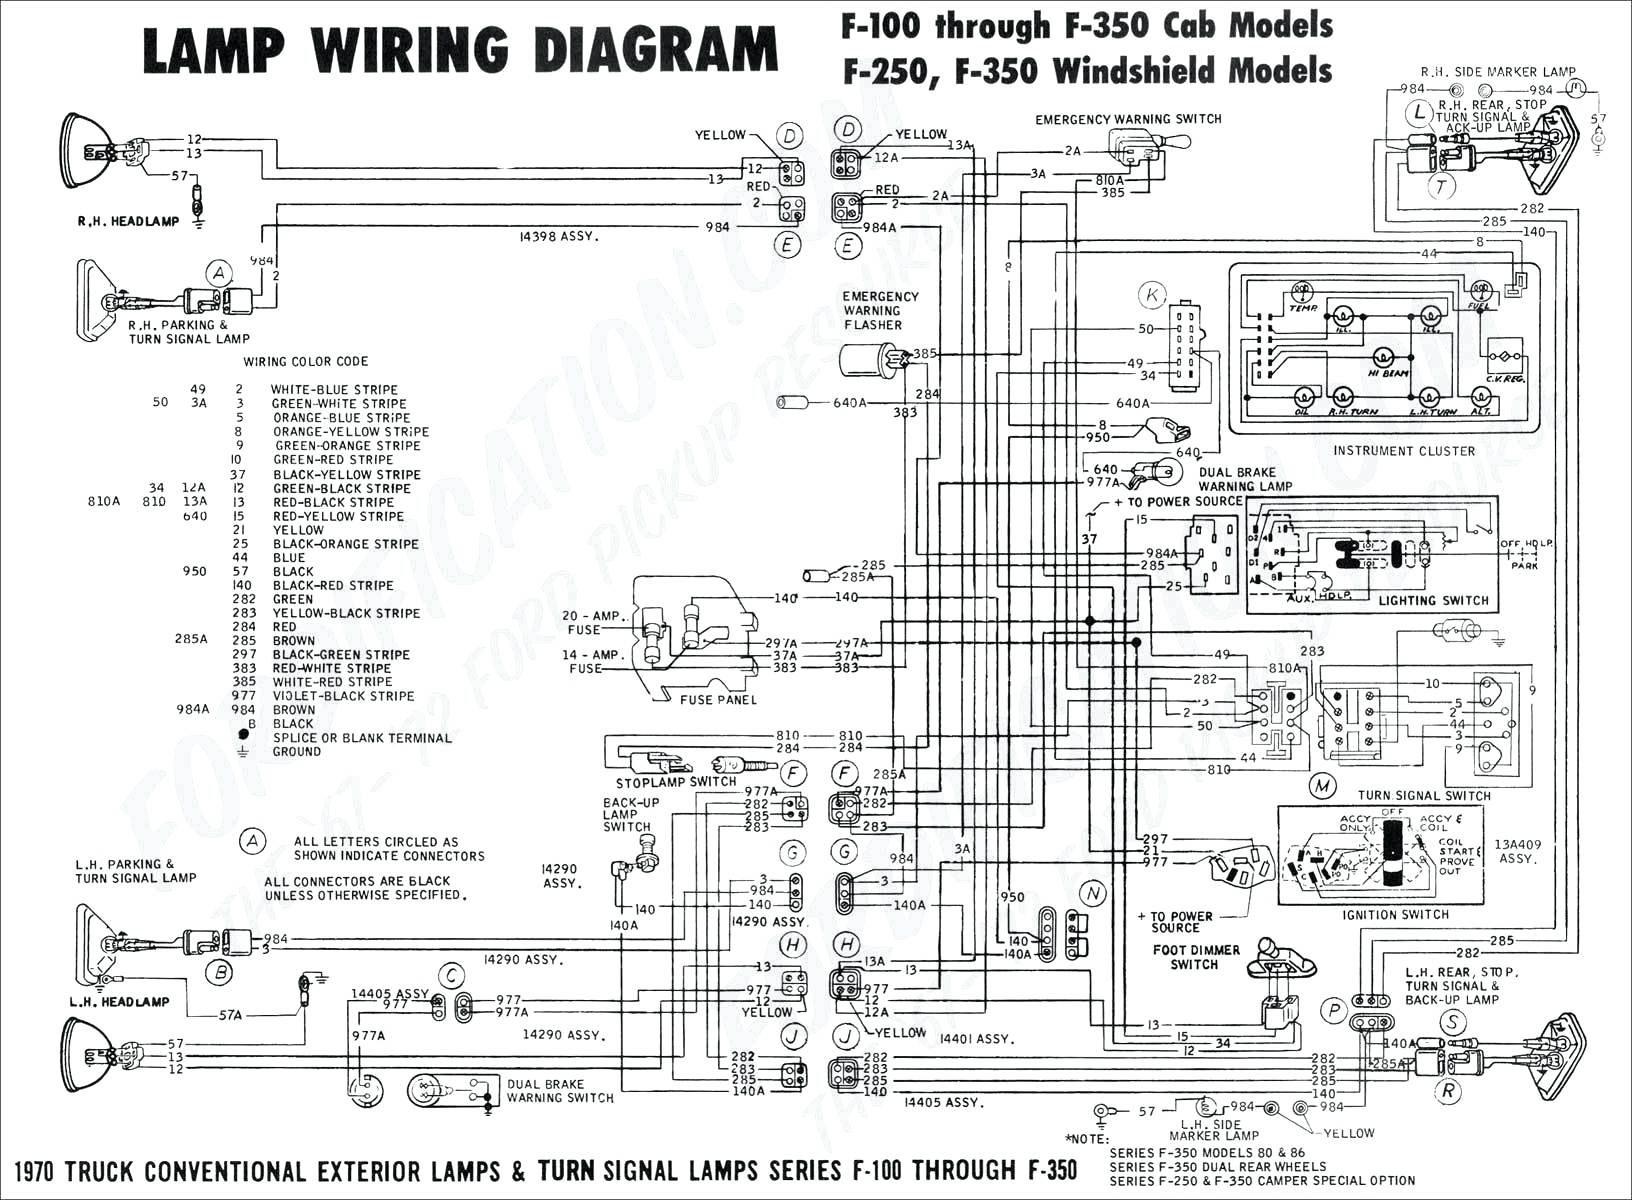 2001 Dodge Caravan Engine Diagram Dodge Lights Wiring Diagram Wiring Diagram Datasource Of 2001 Dodge Caravan Engine Diagram